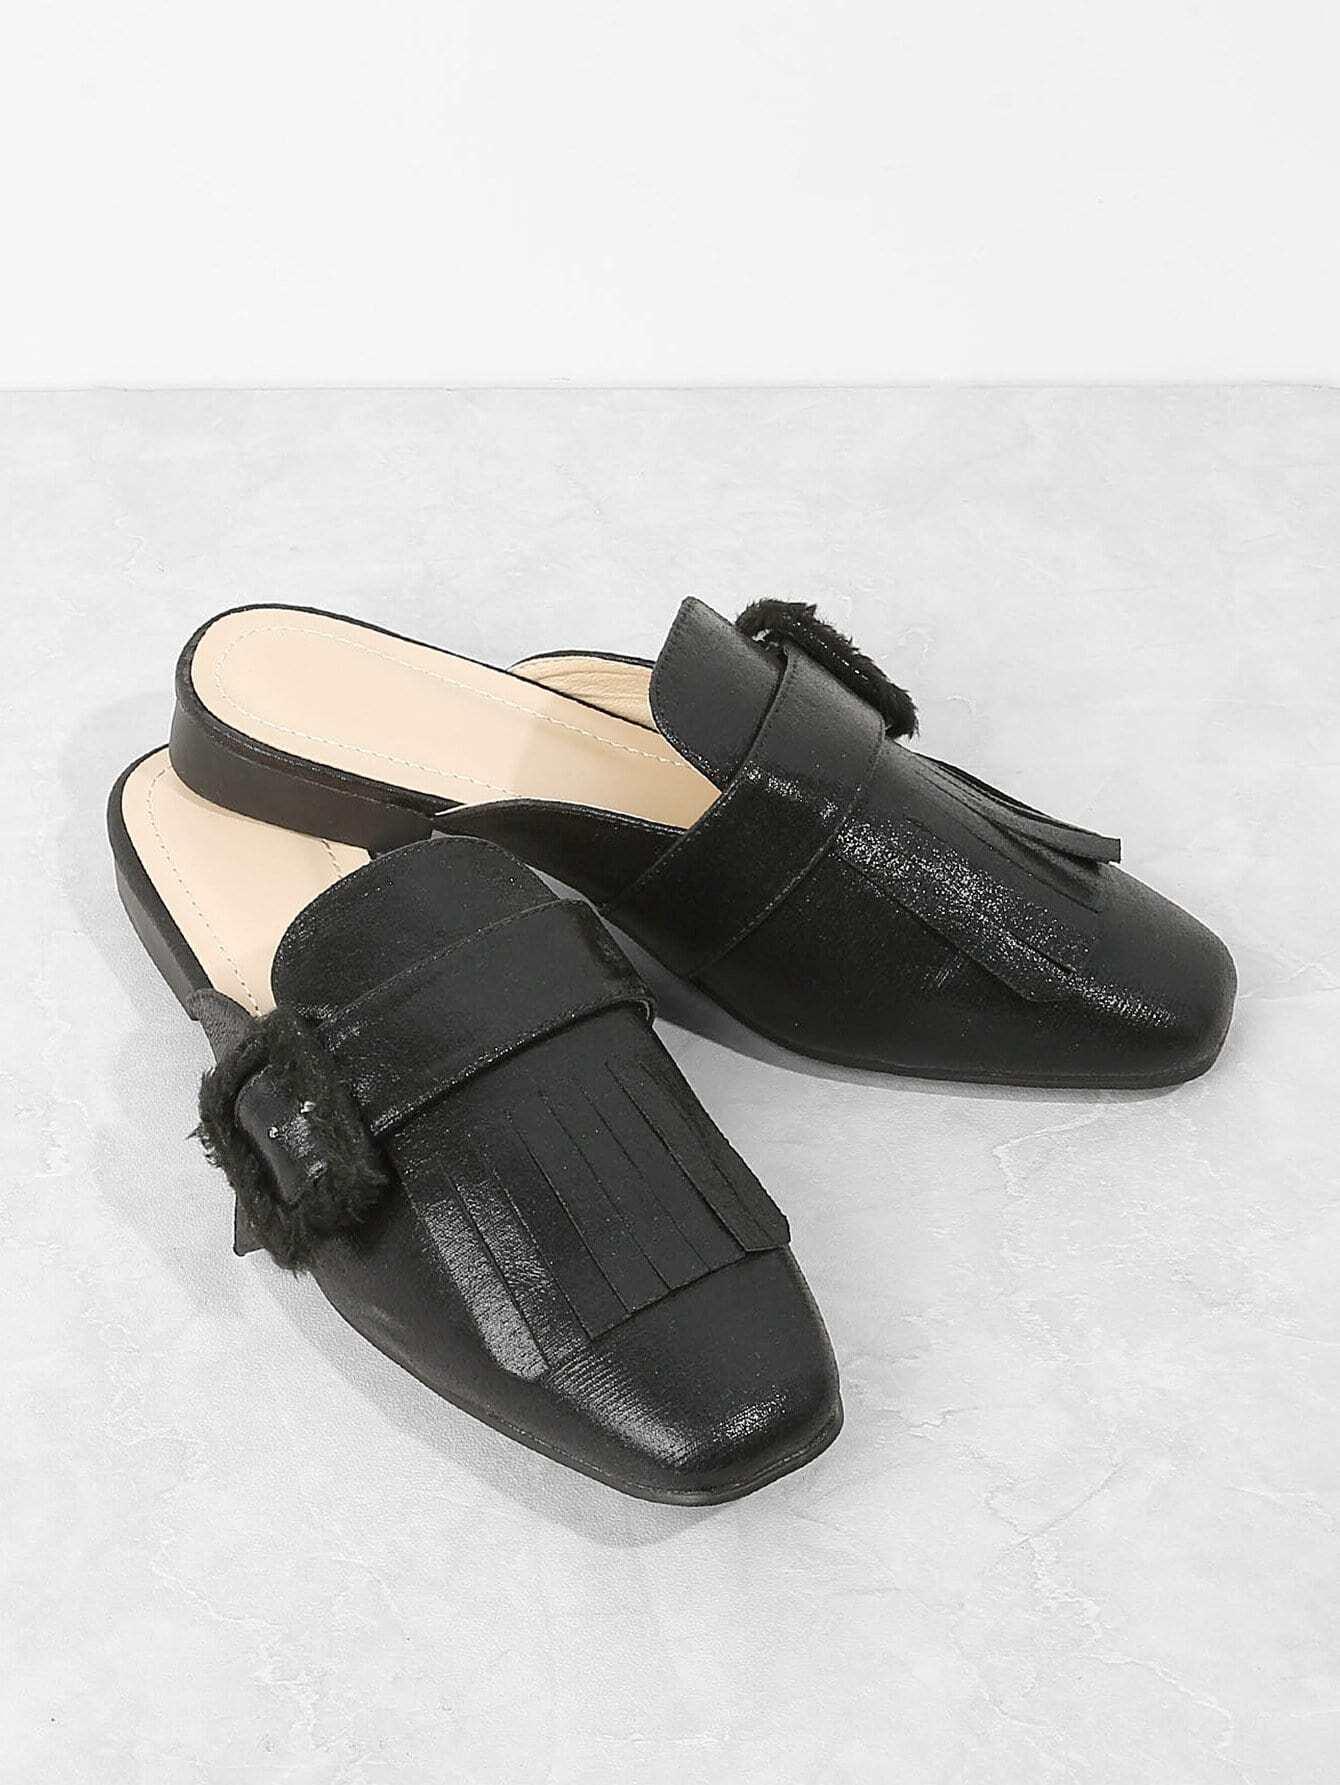 1a0a565cc6e Faux Fur Detail Square Toe Flats EmmaCloth-Women Fast Fashion Online